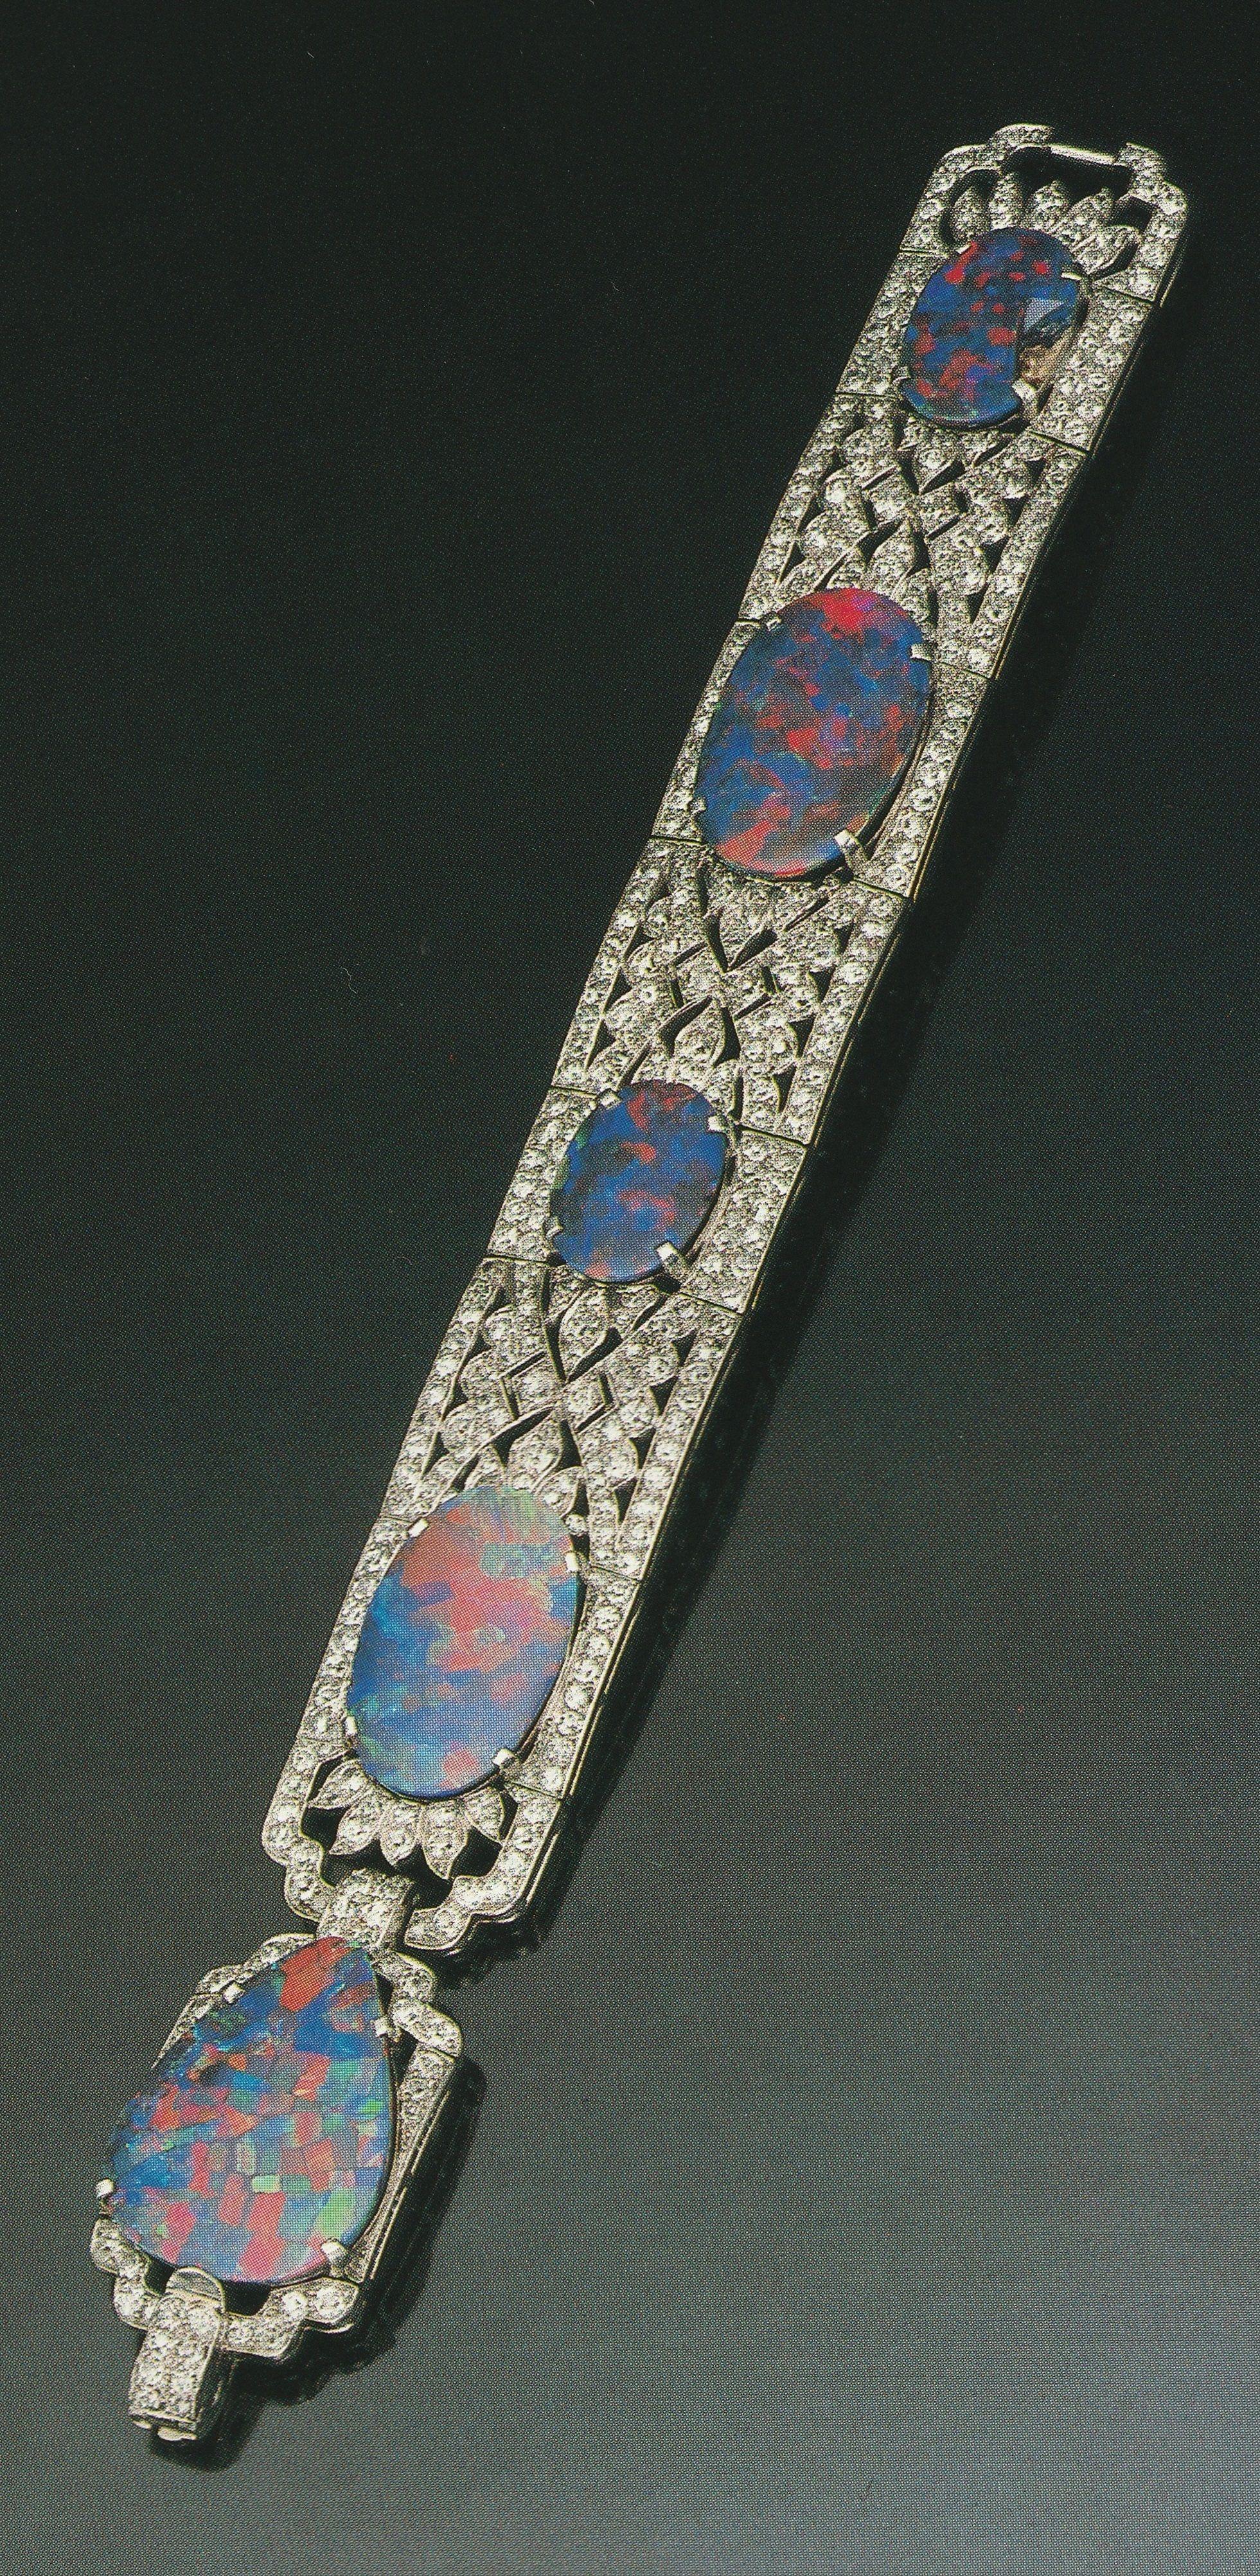 Cartier an important art deco opal and diamond bracelet circa